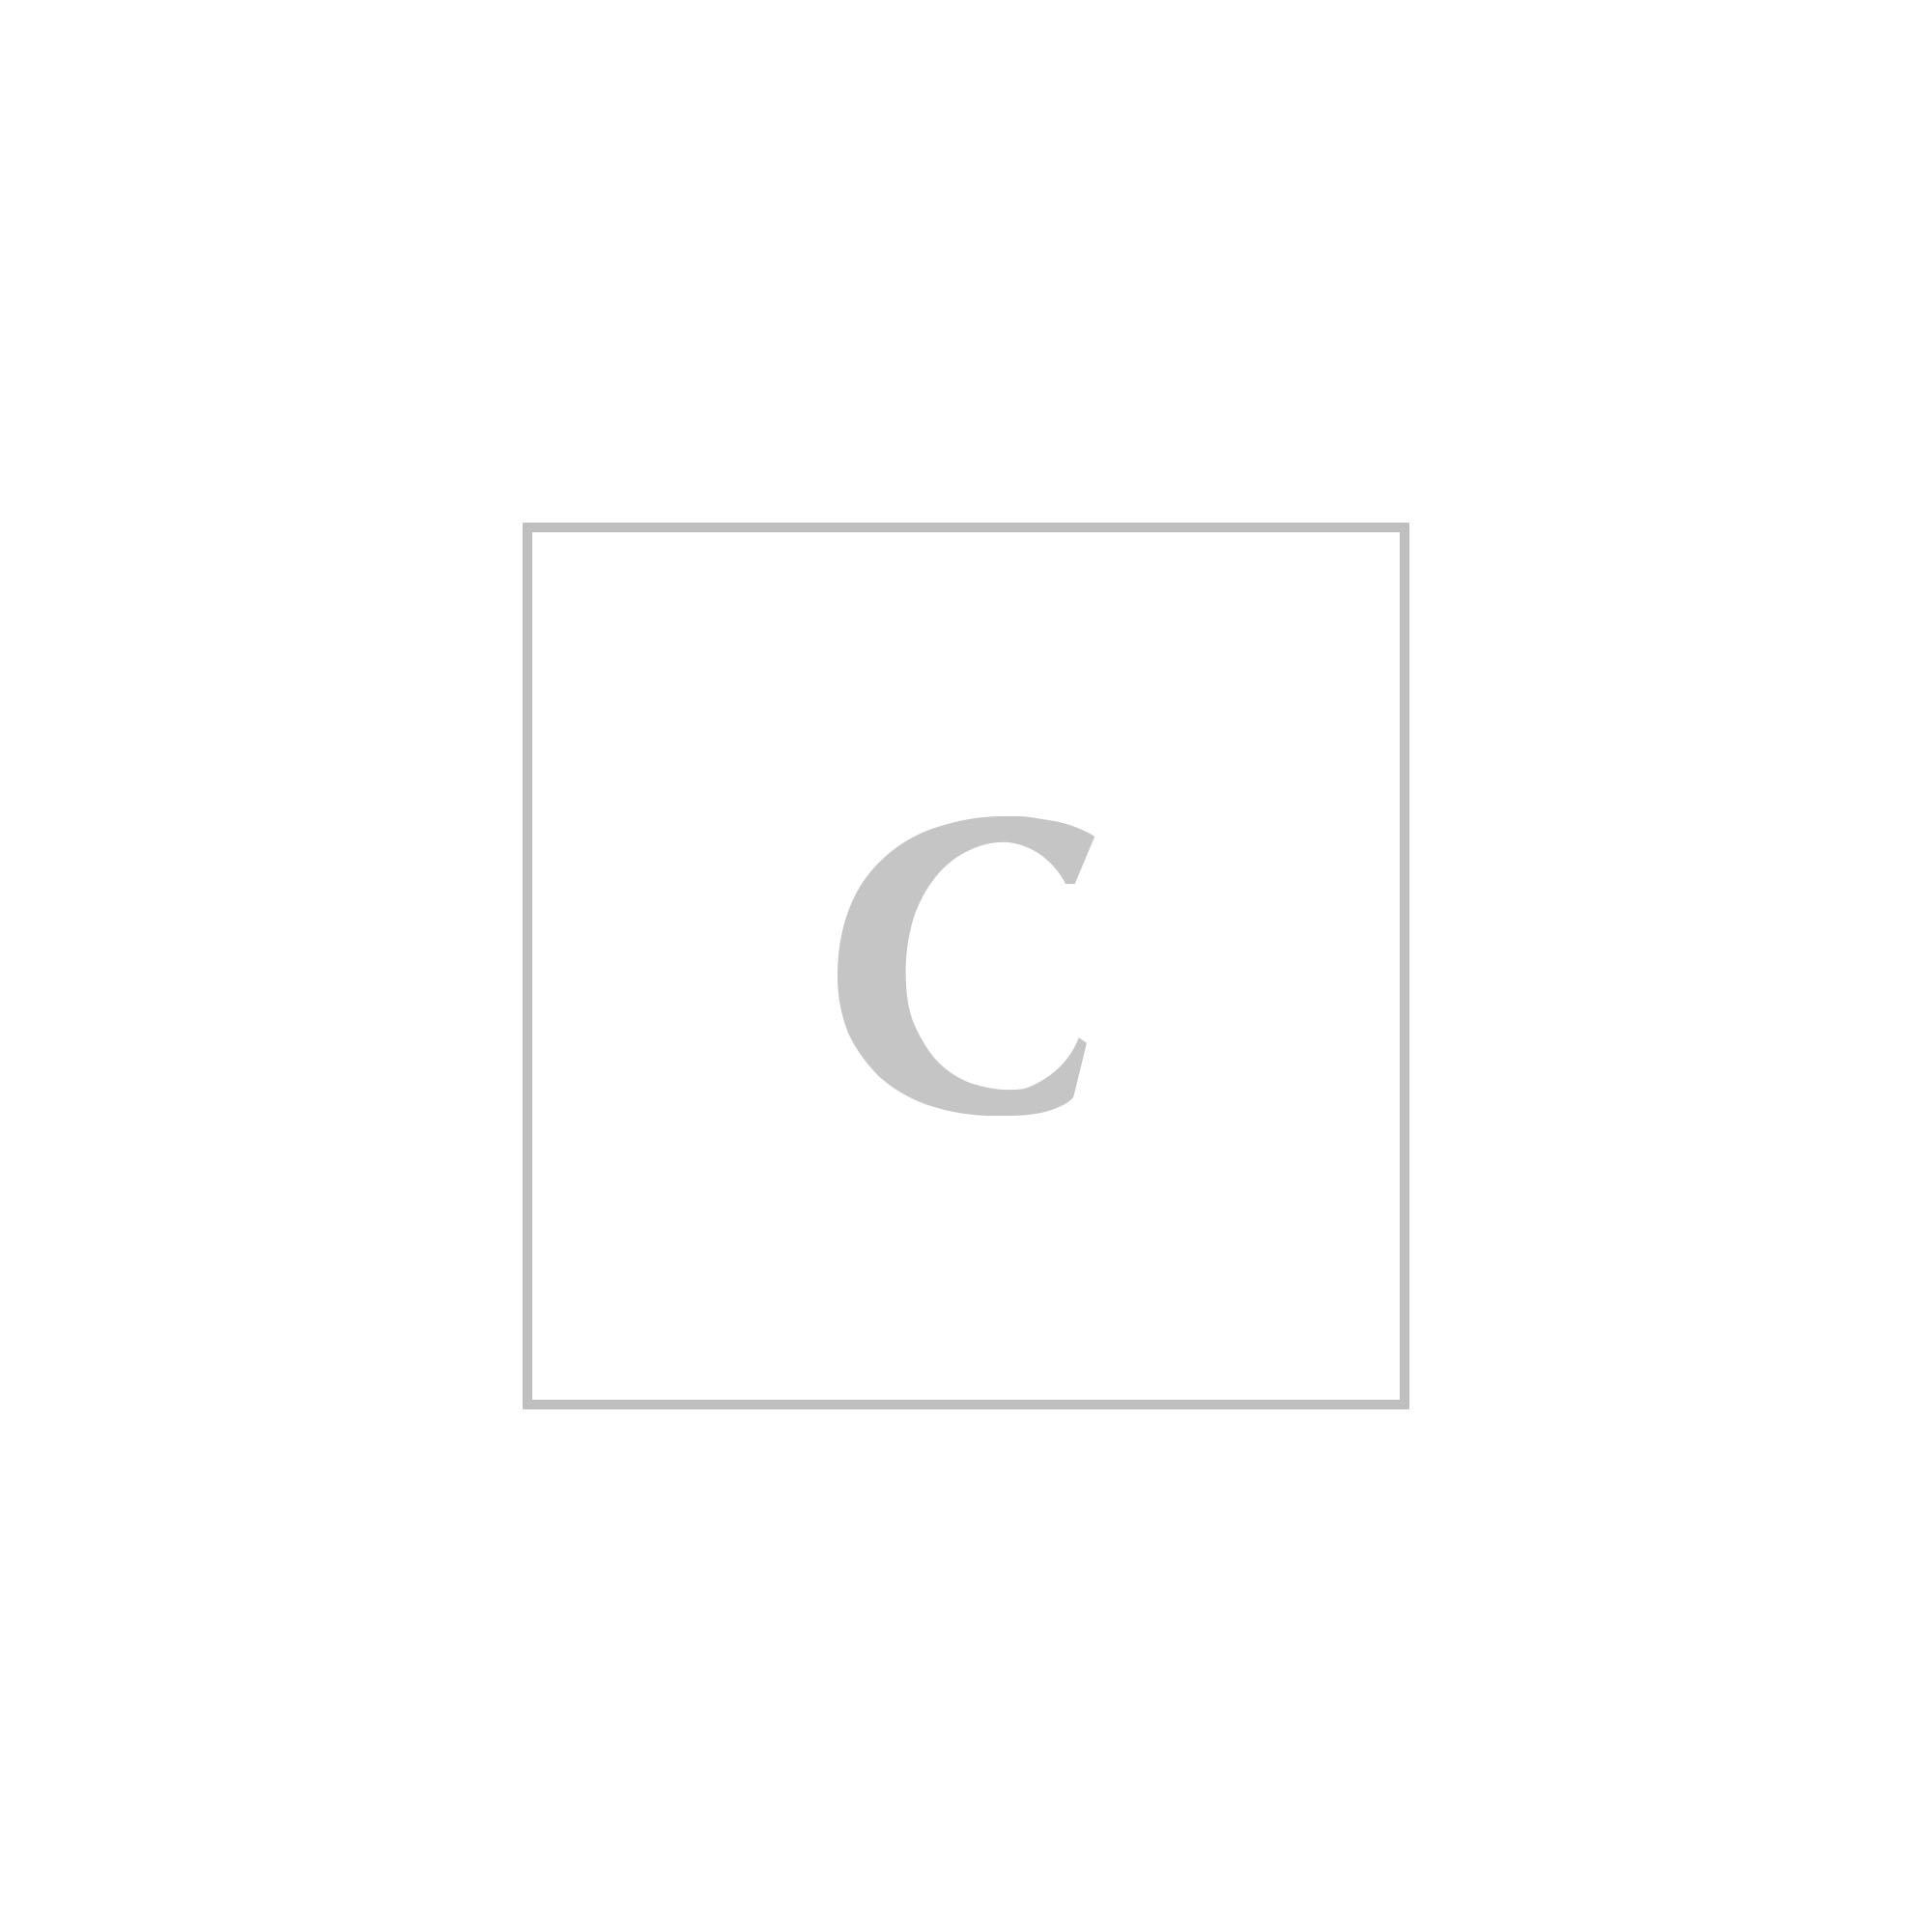 Christian Dior borsa lady dior md iridescent patent